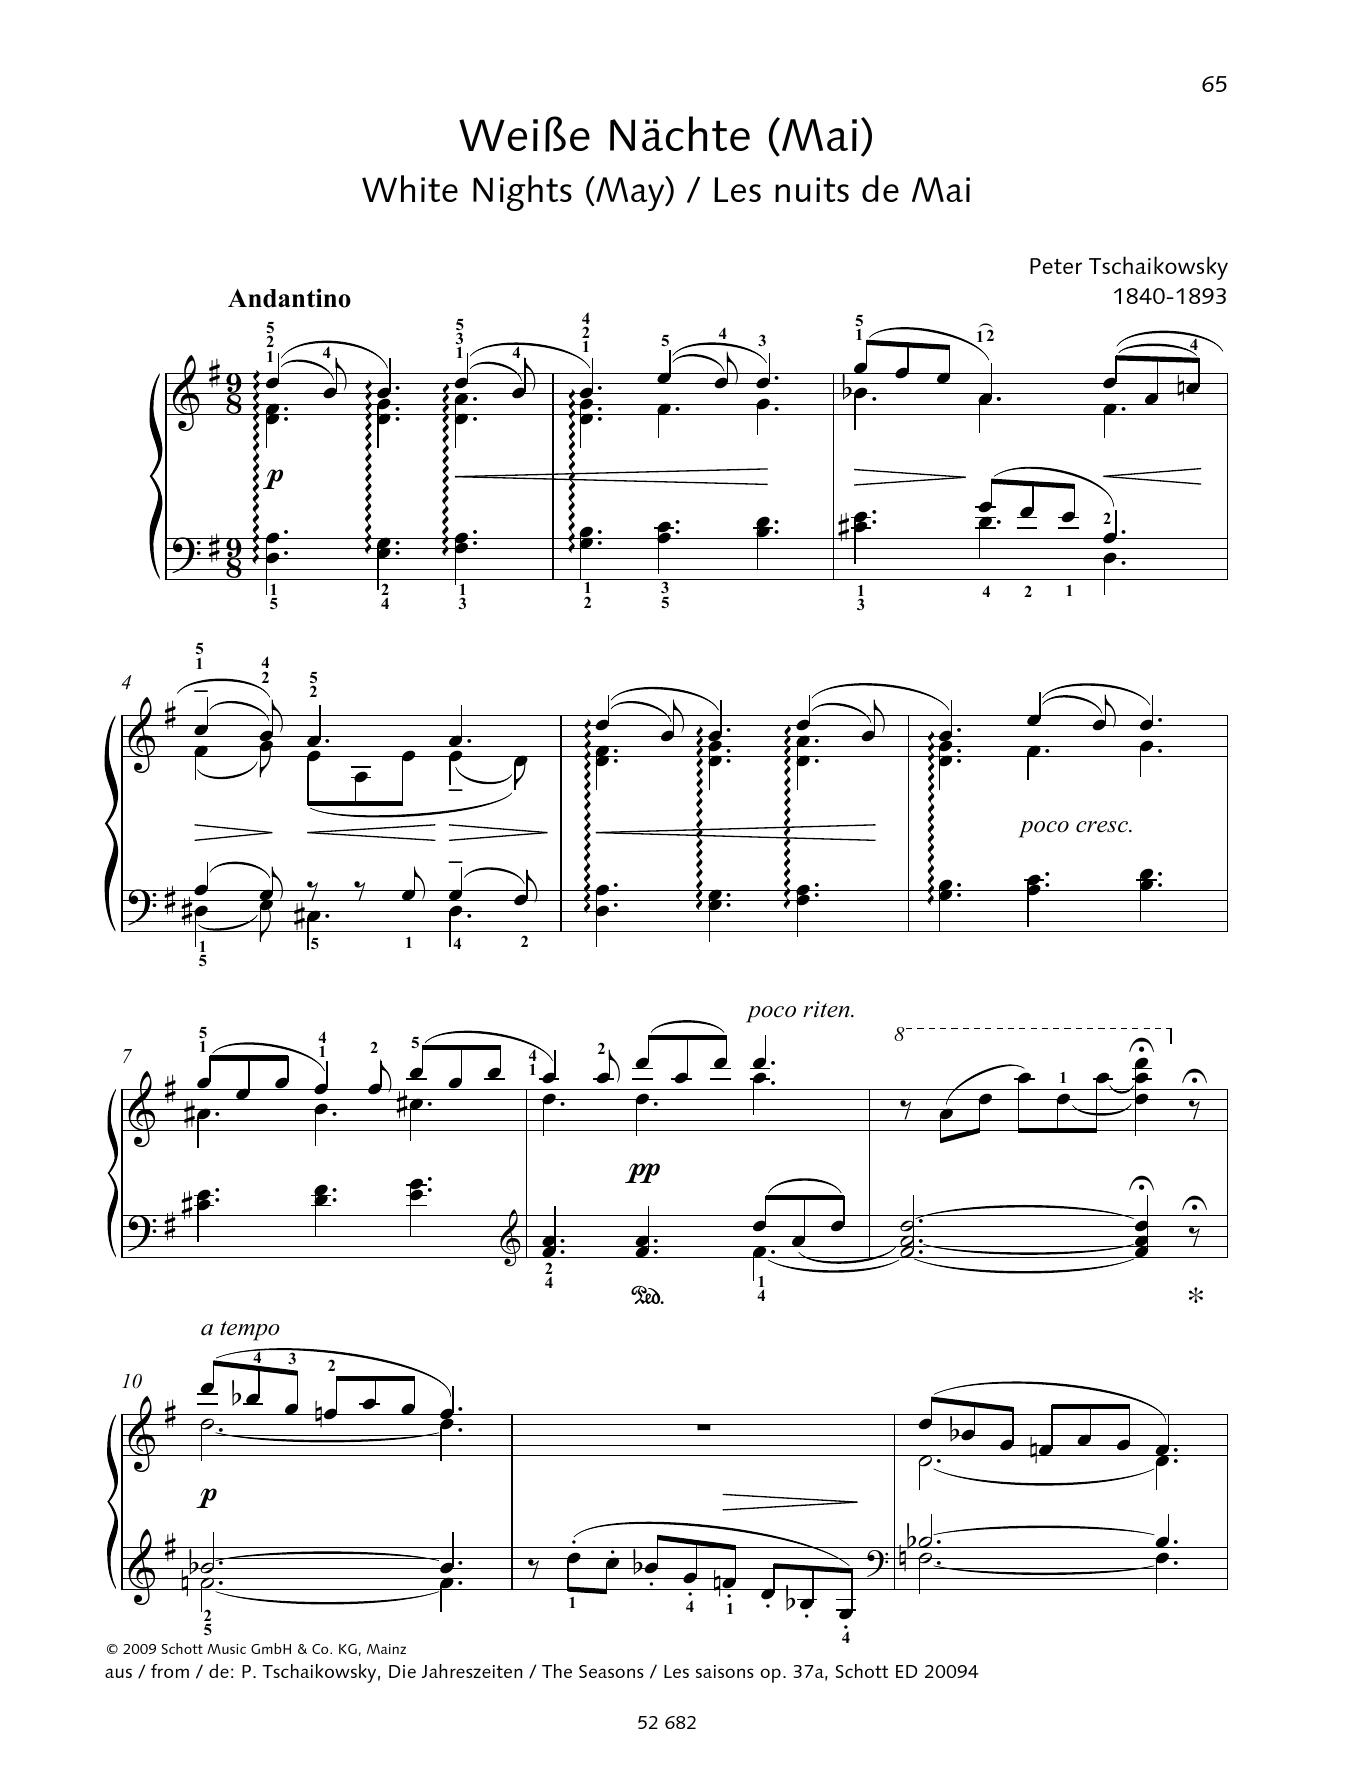 White Nights (May) Sheet Music